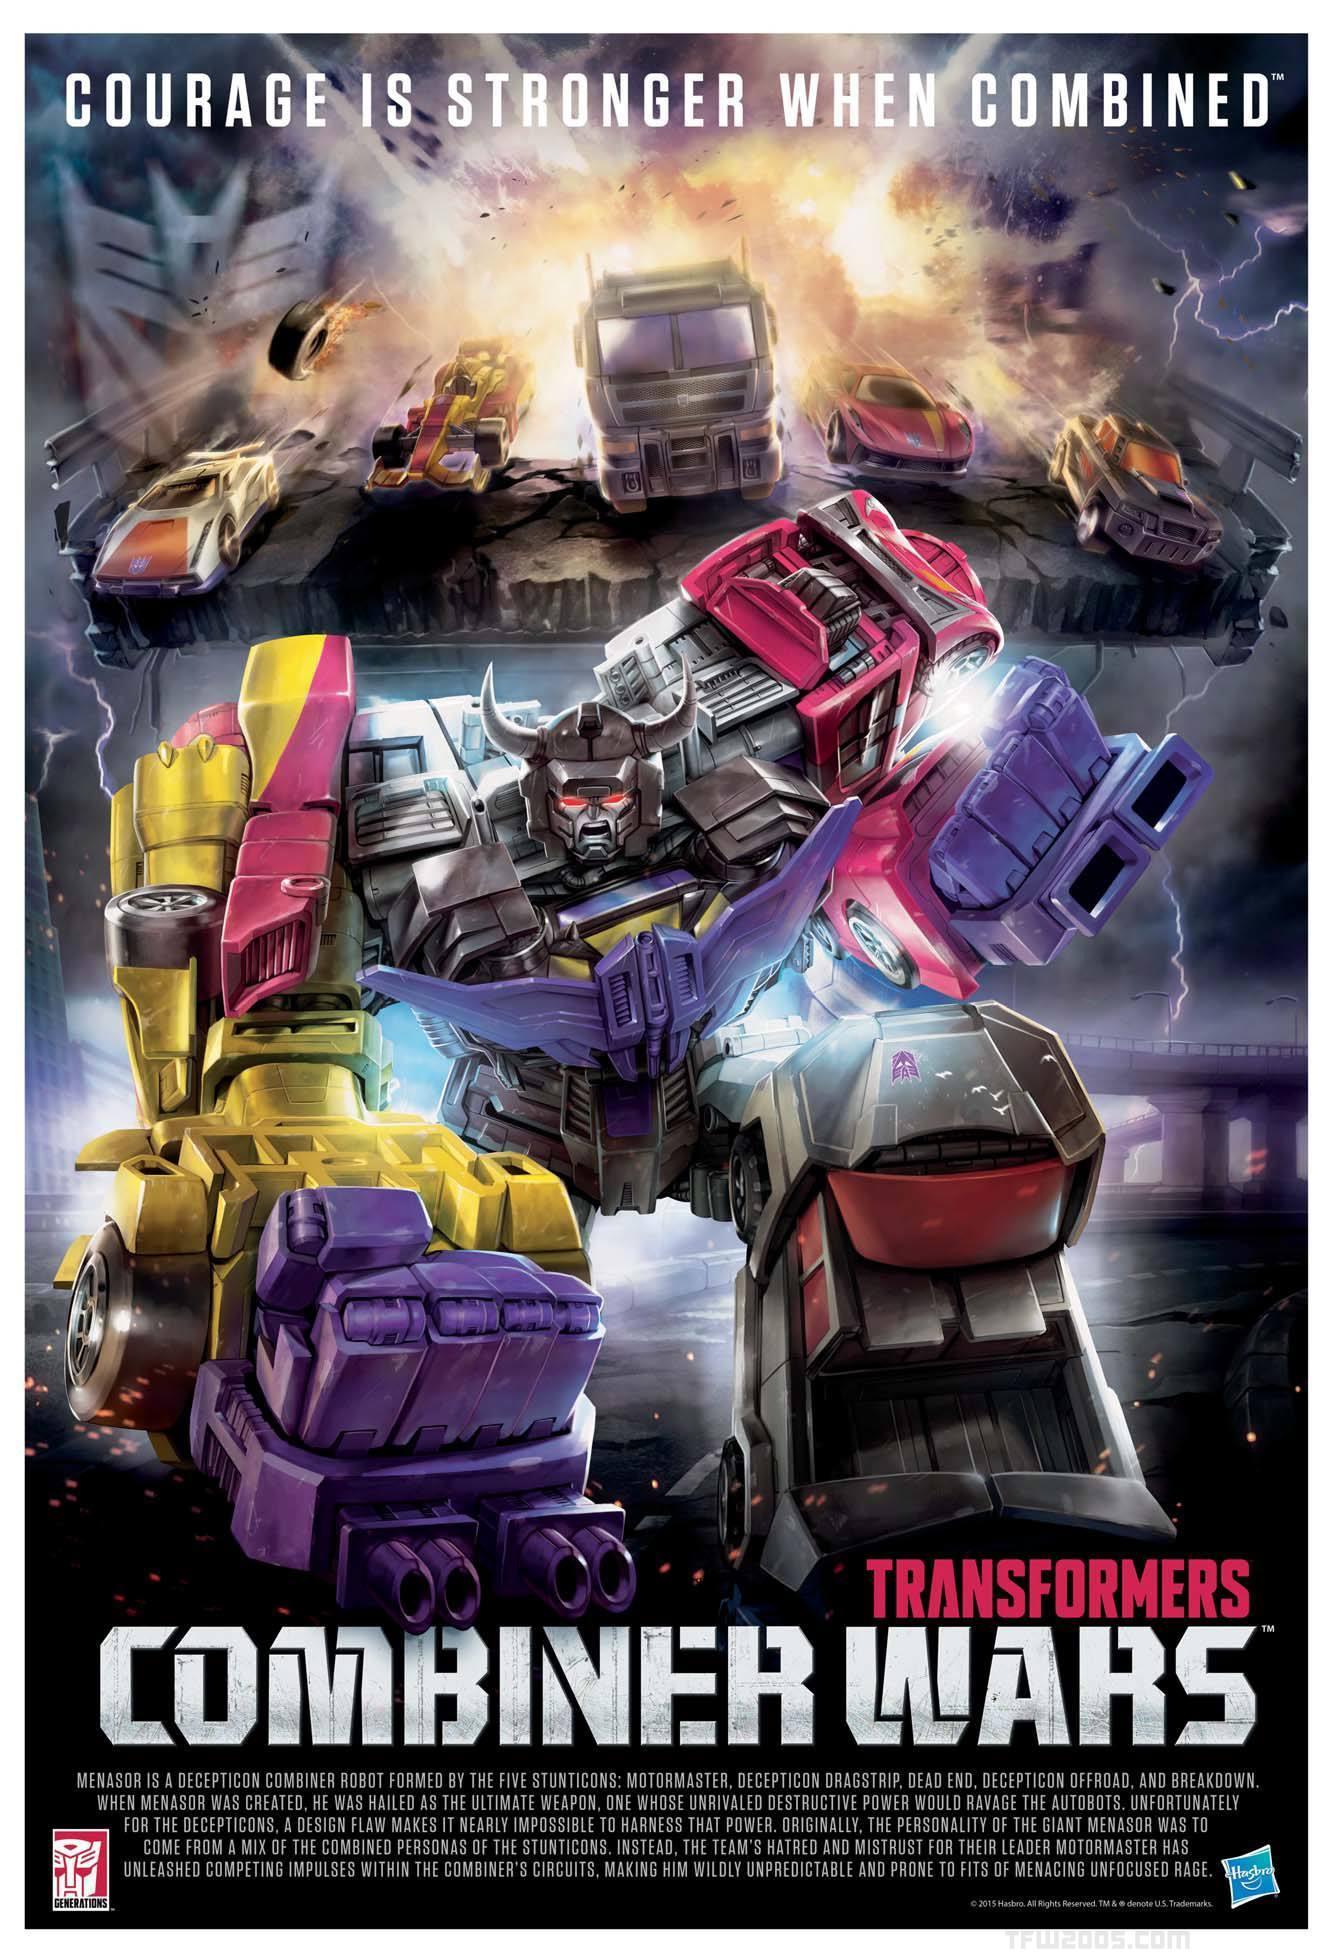 Transformers-Combiner-Wars-Stunticons-Menasor-Poster_1432475748.jpg